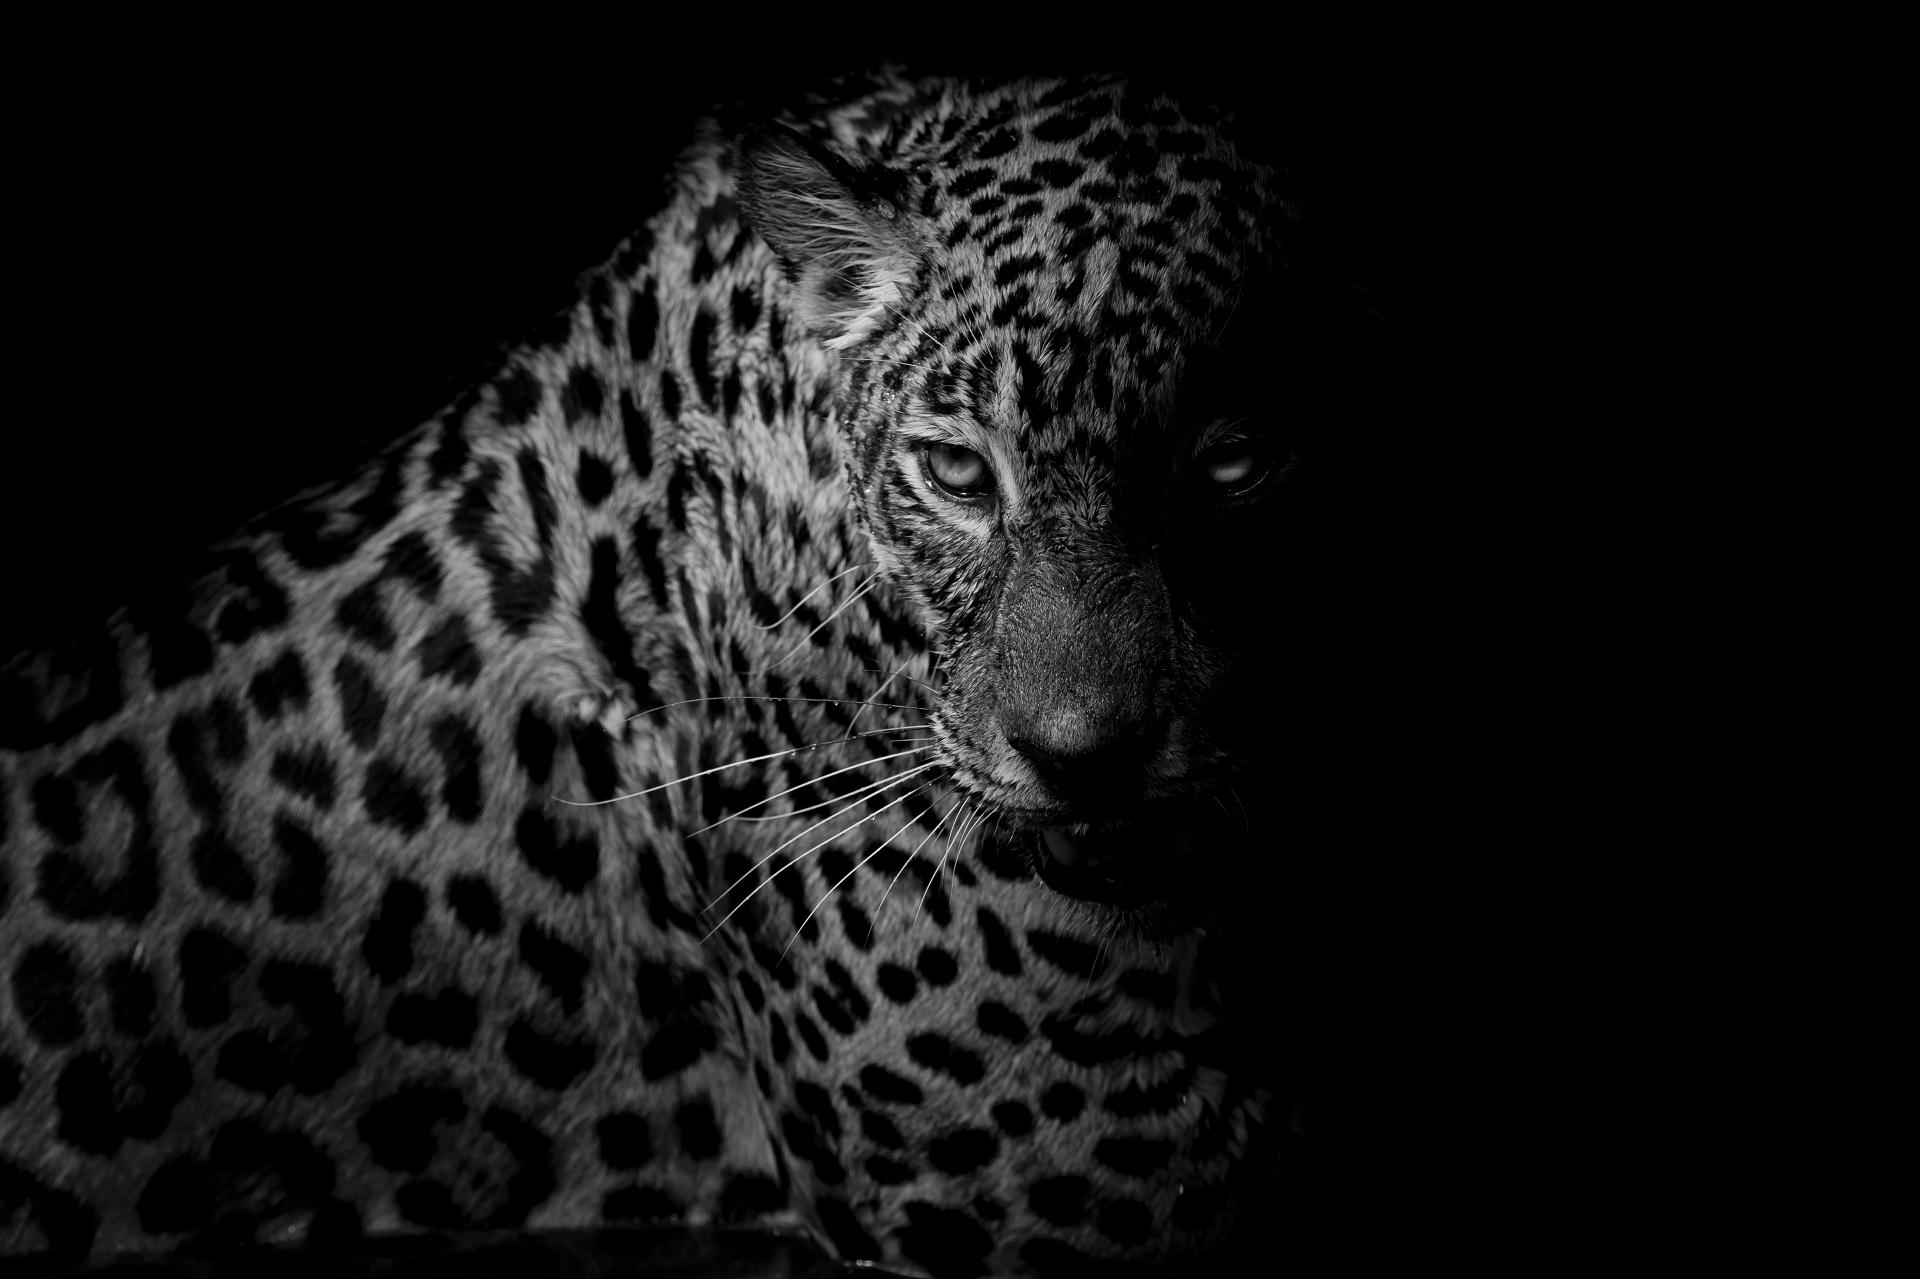 white cheetah wallpaper hd - photo #18